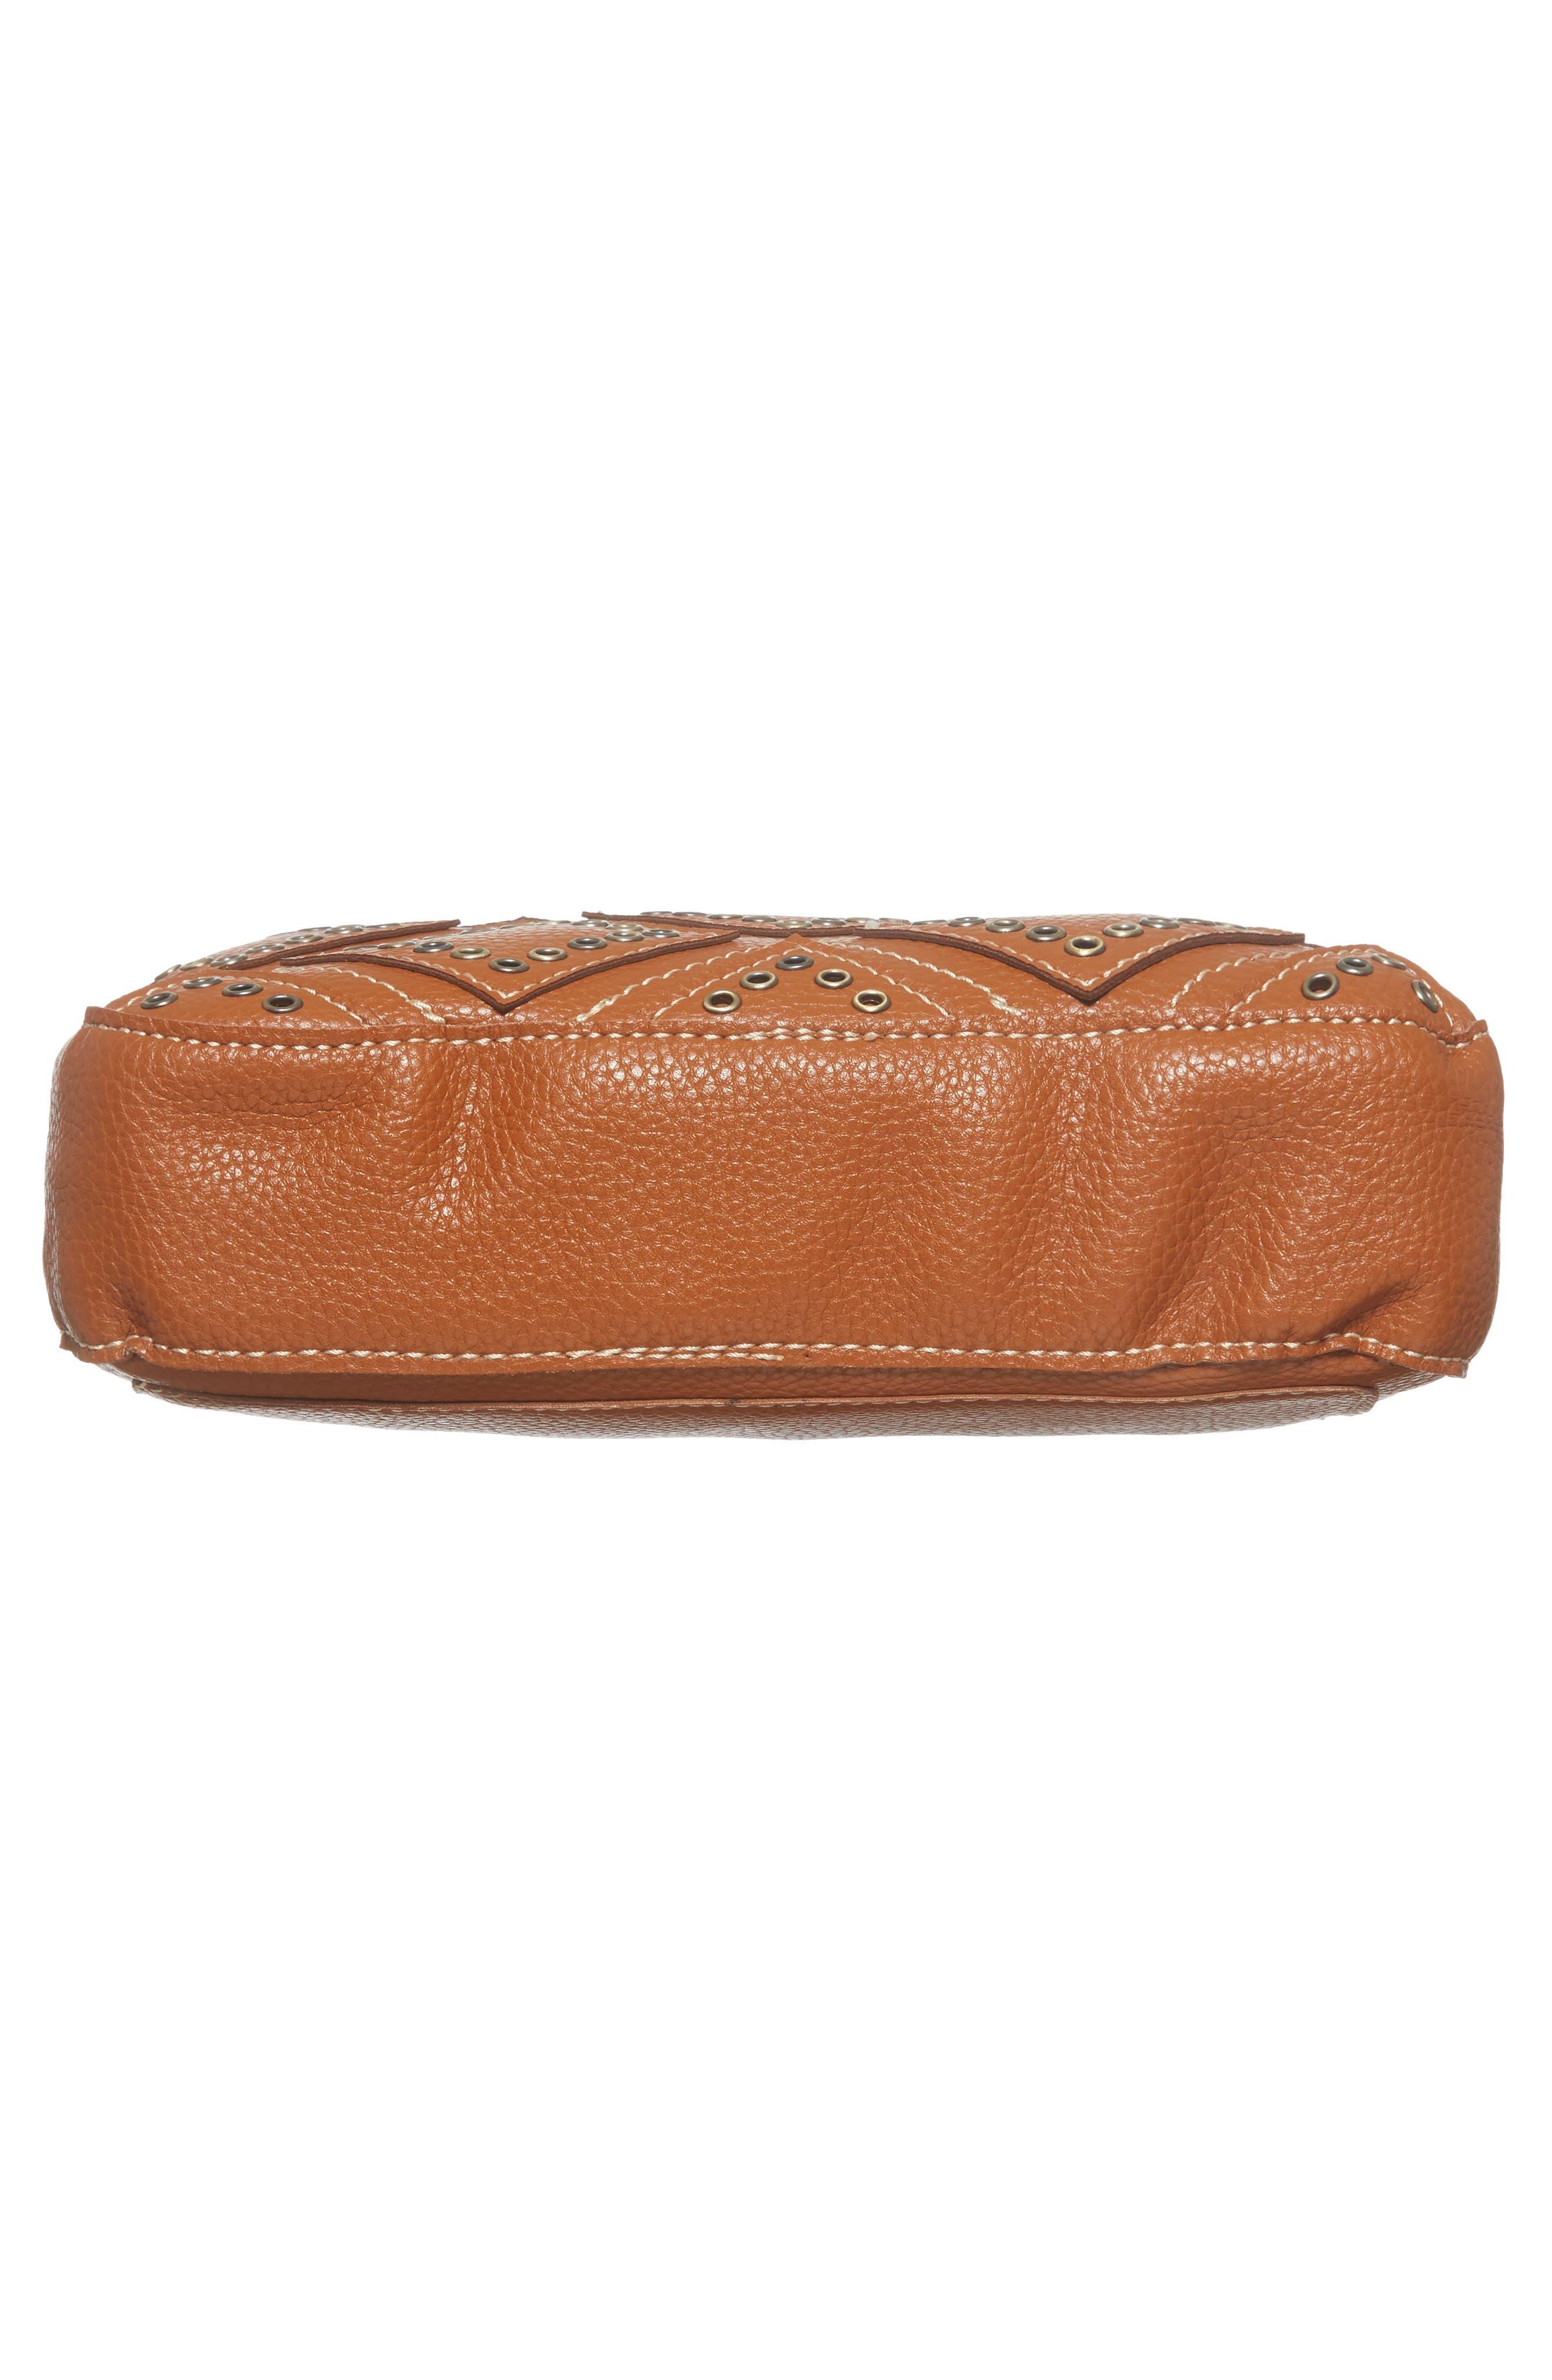 Skylar Faux Leather Crossbody Bag,                             Alternate thumbnail 6, color,